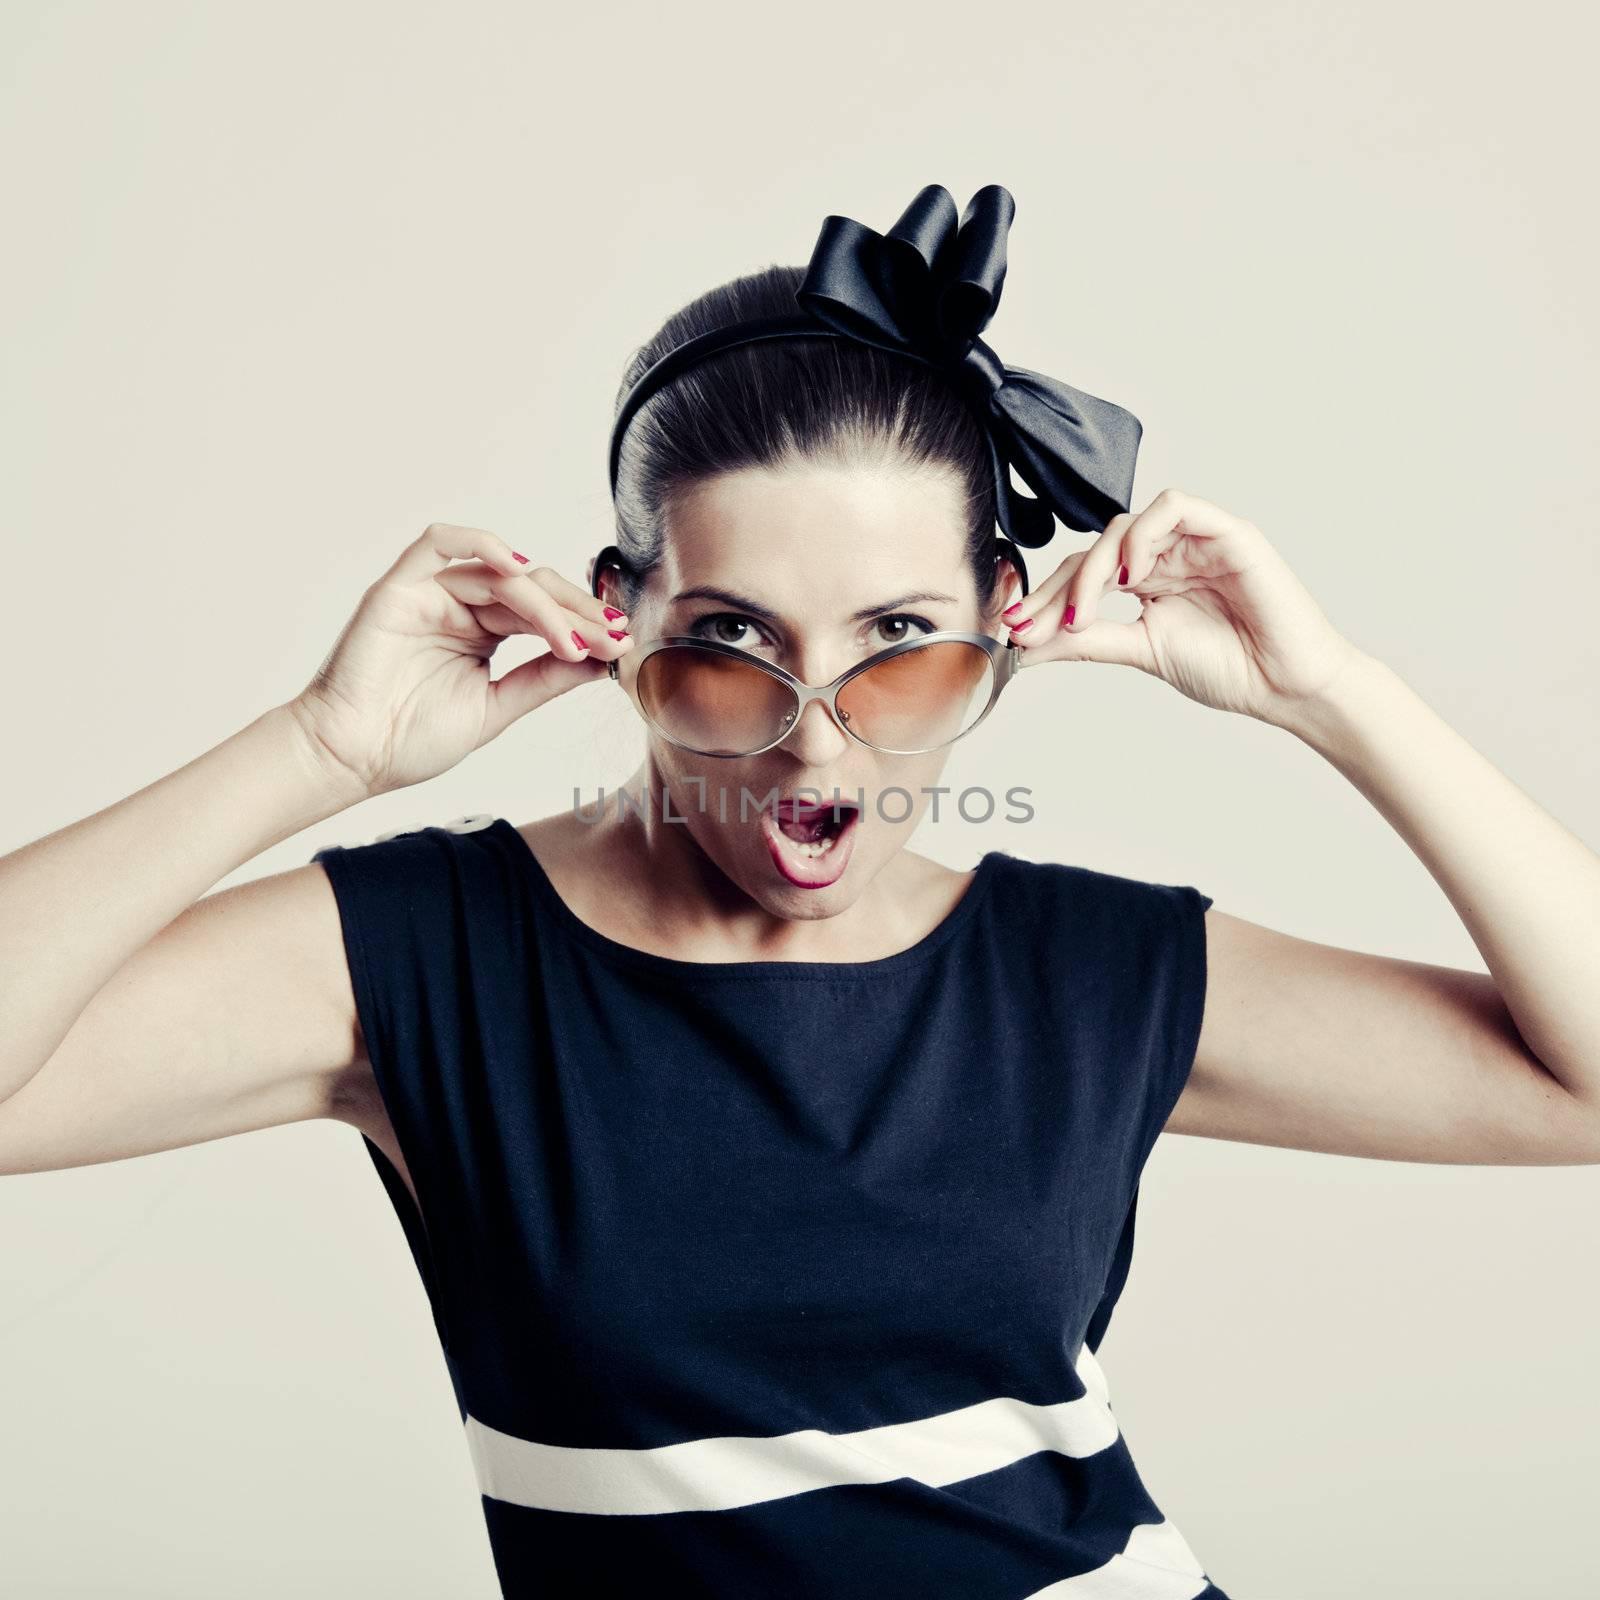 Portrait of a beautiful fashion woman posing with sunglasses